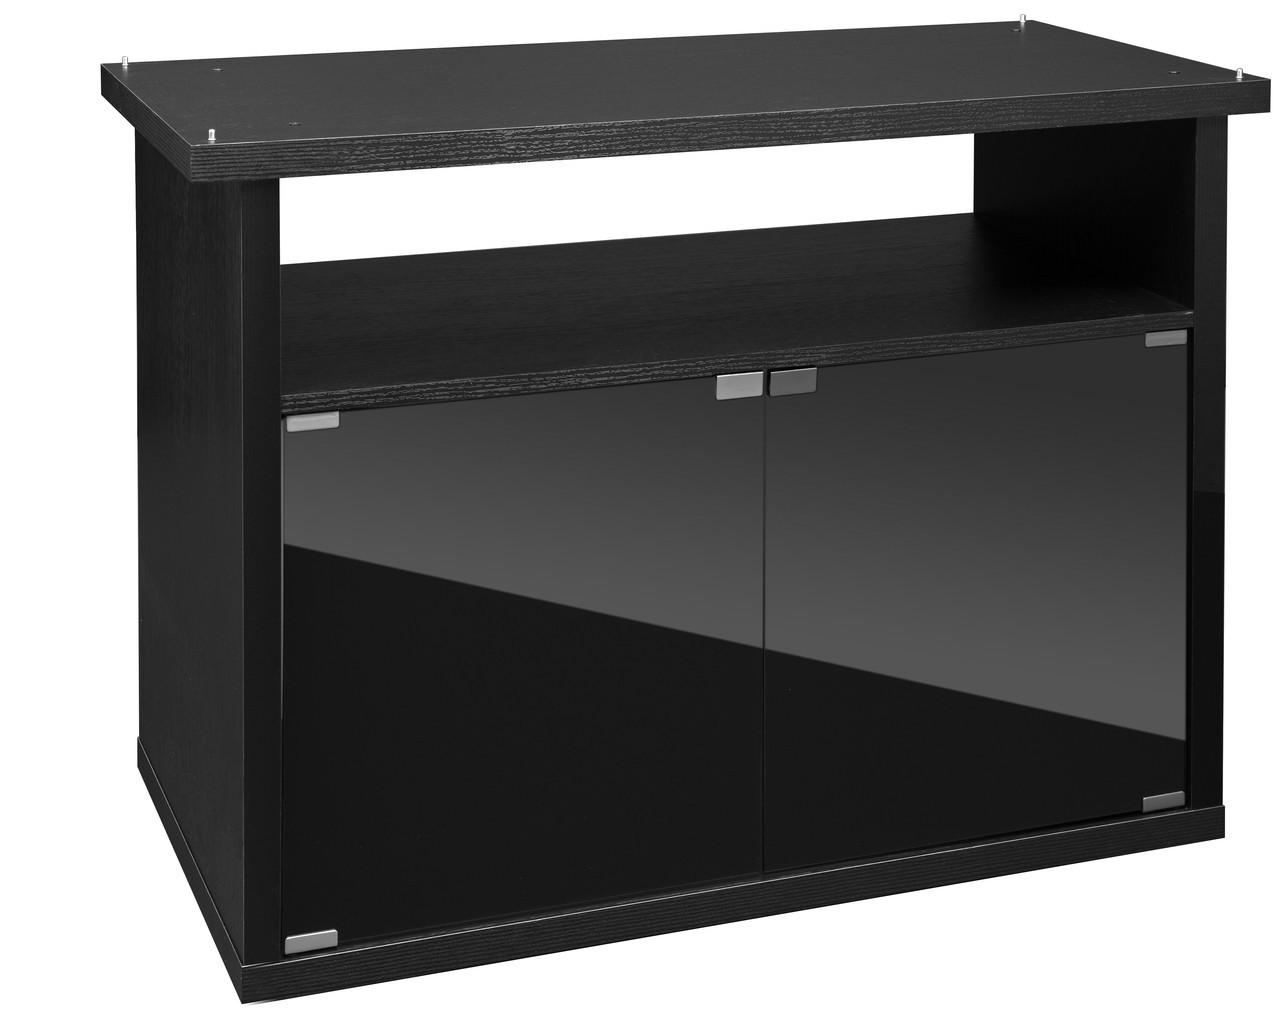 Подставка под террариум Hagen Exo Terra 90x45x70 см черная (РТ2708)